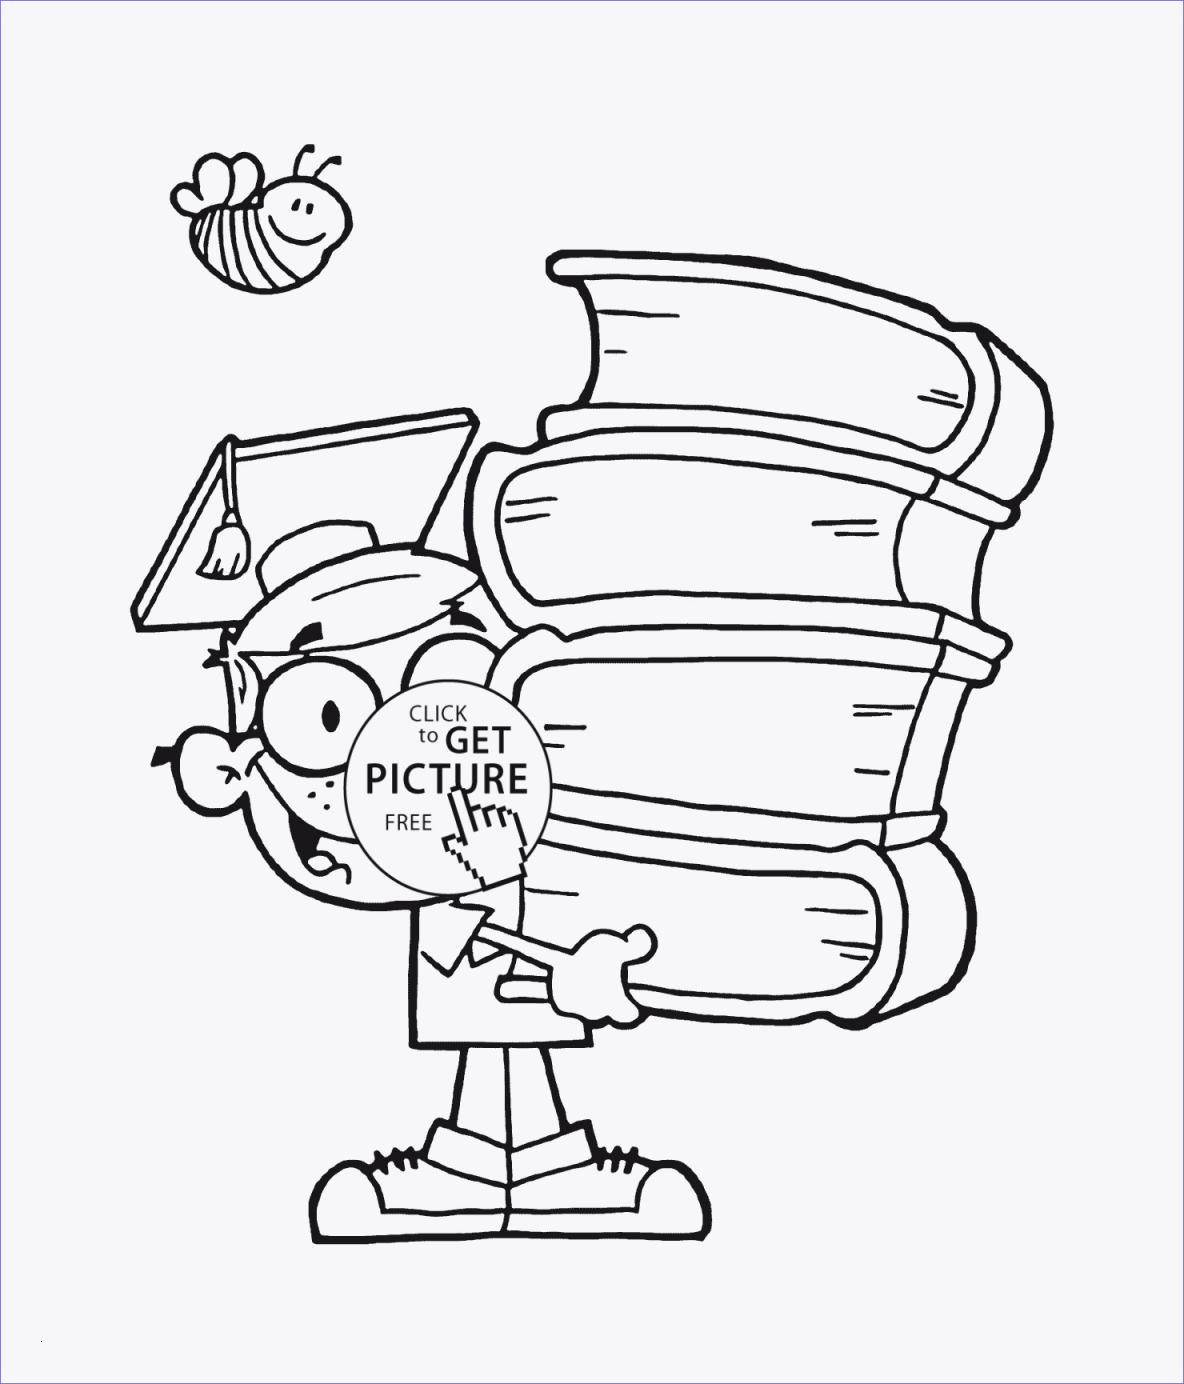 Mickey Mouse Zum Ausmalen Genial Malvorlagen Igel Frisch Igel Grundschule 0d Archives Uploadertalk Galerie